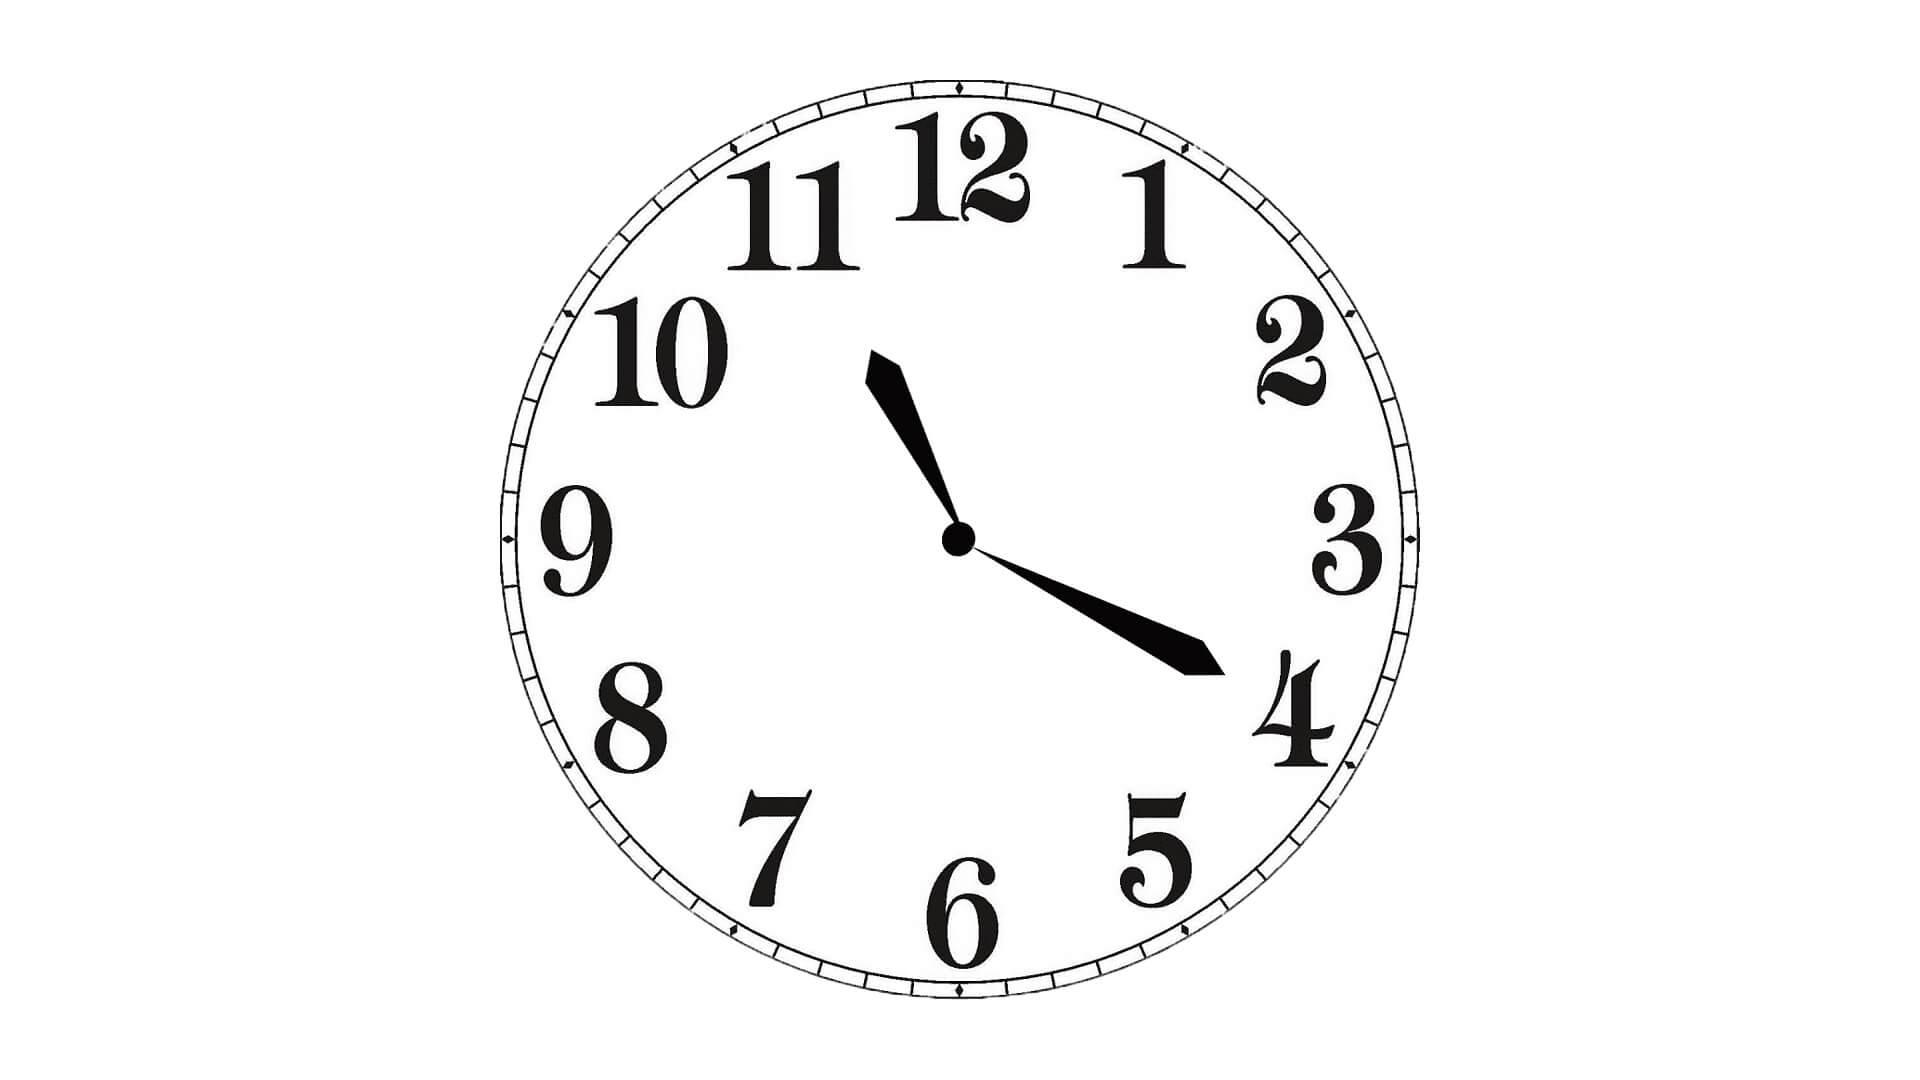 Циферблат часов.